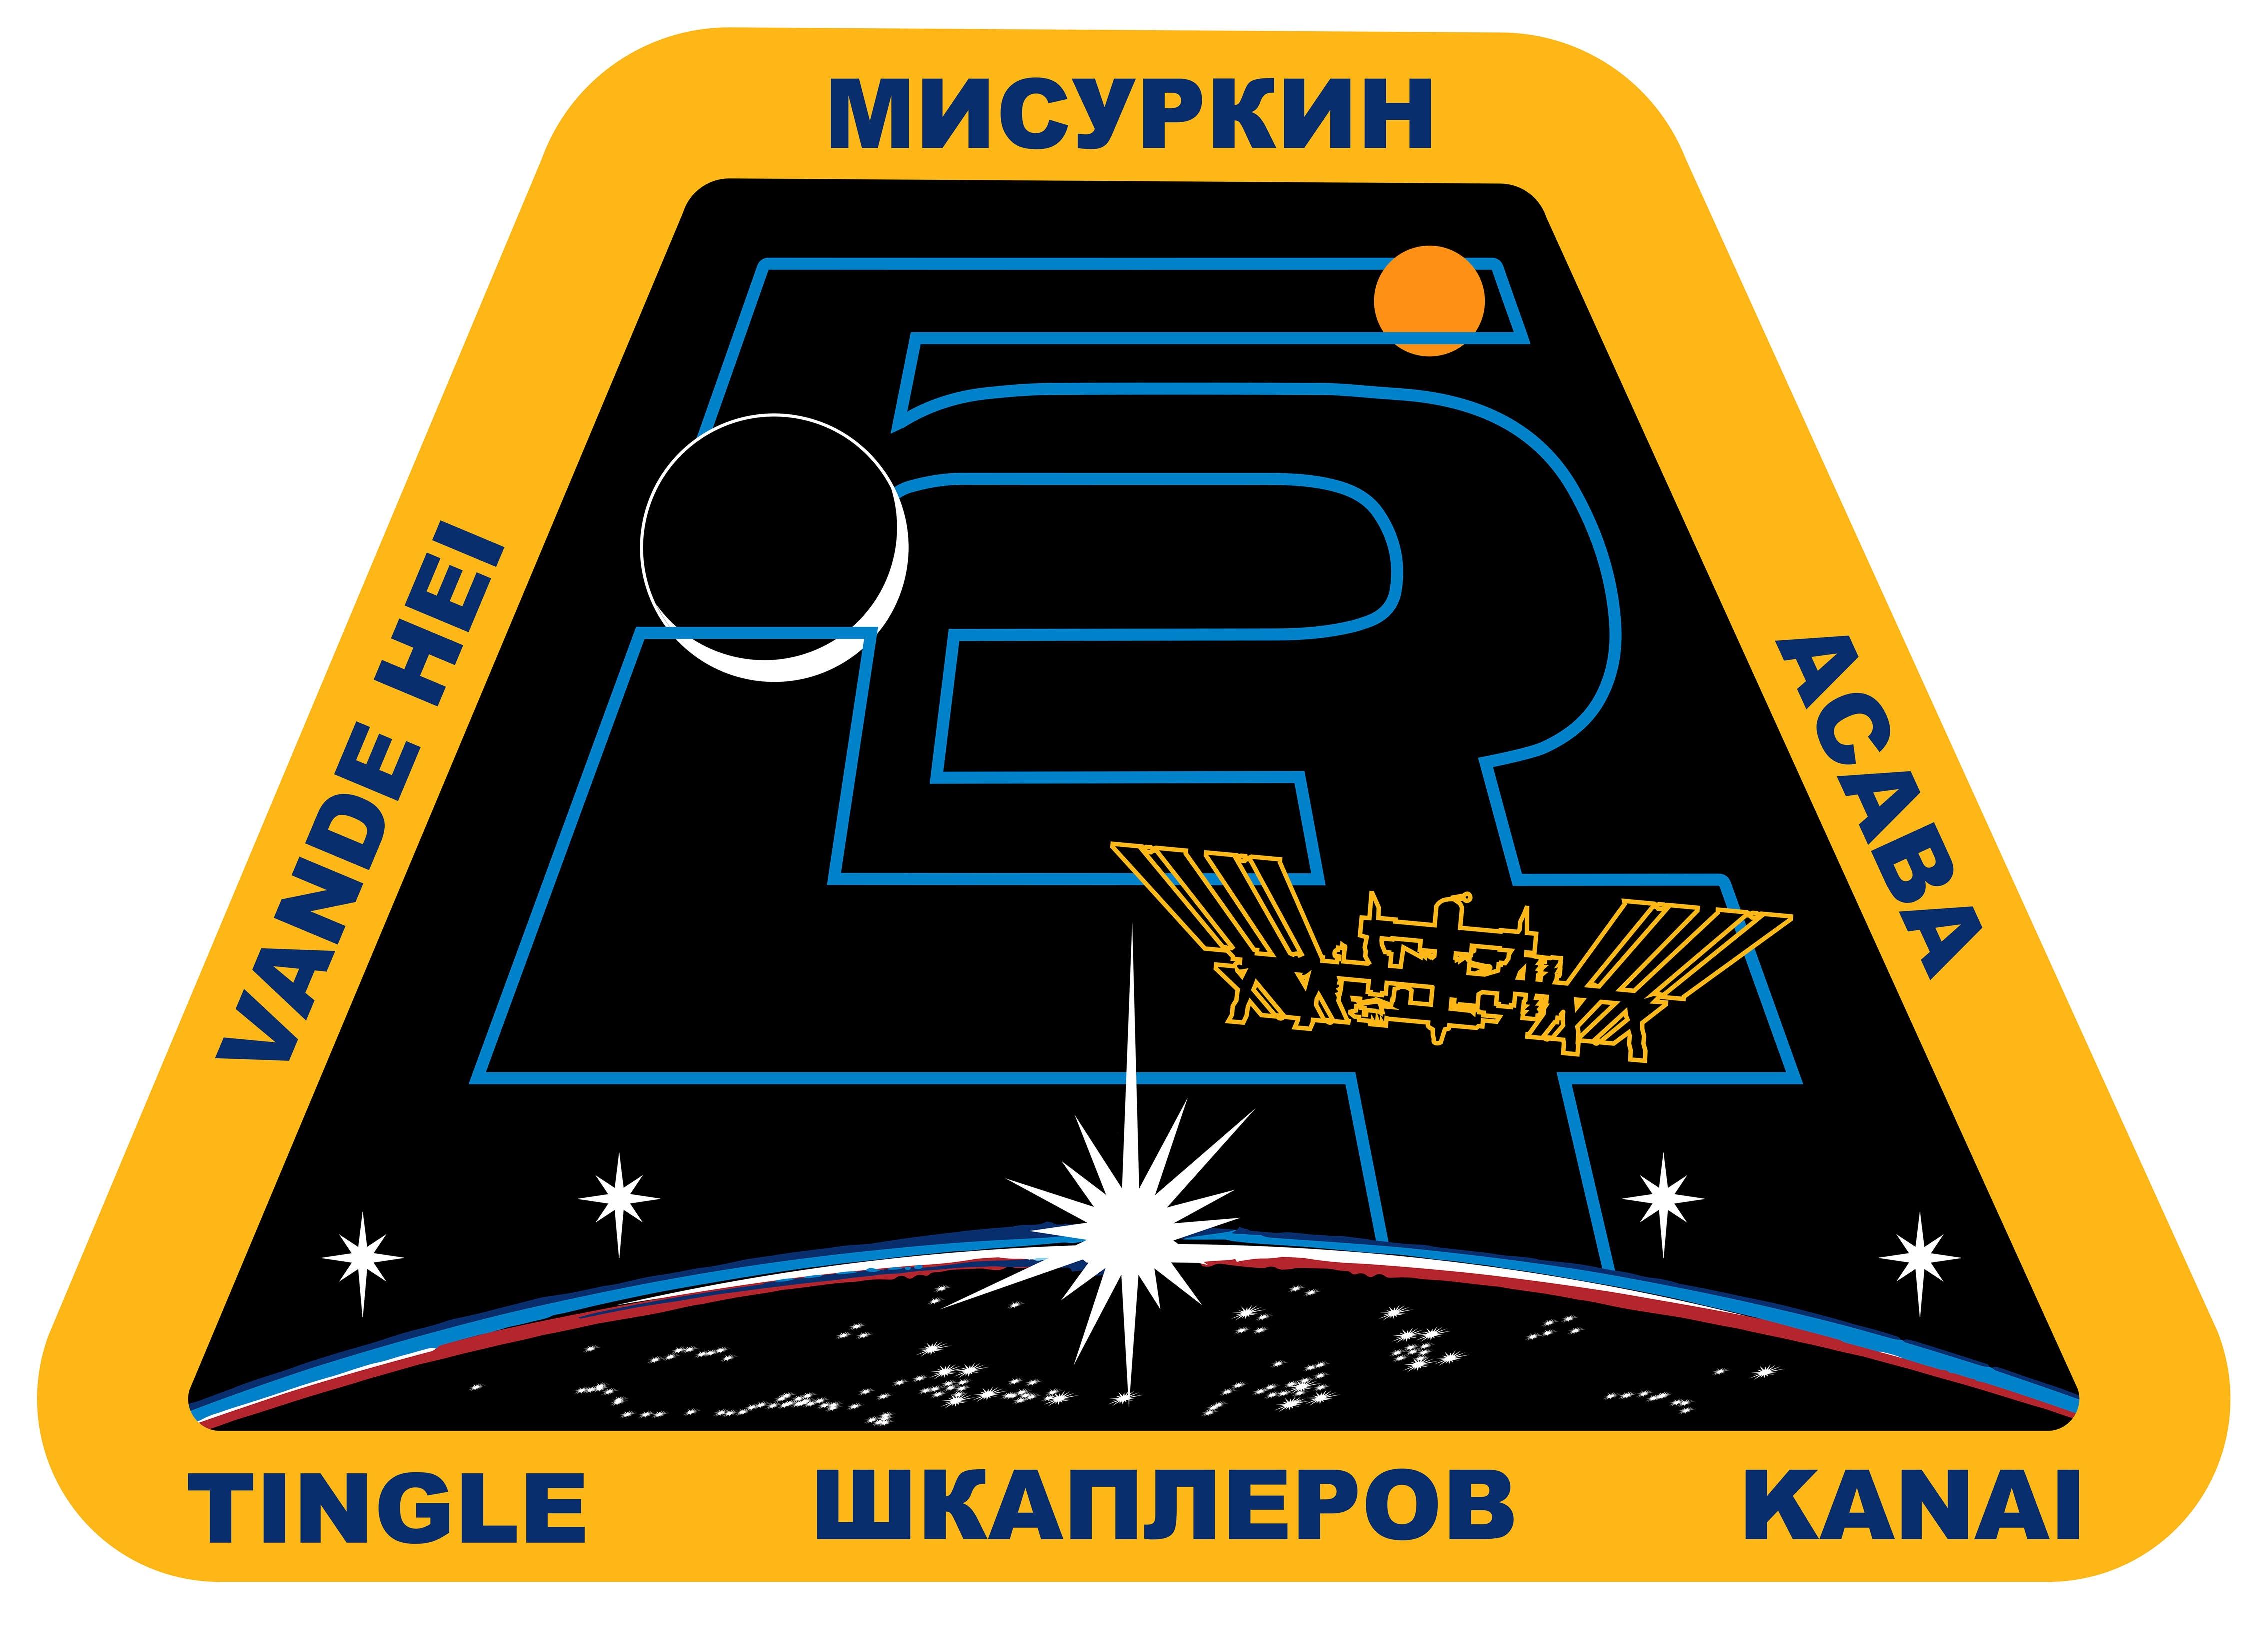 Image: NASA / Roscosmos